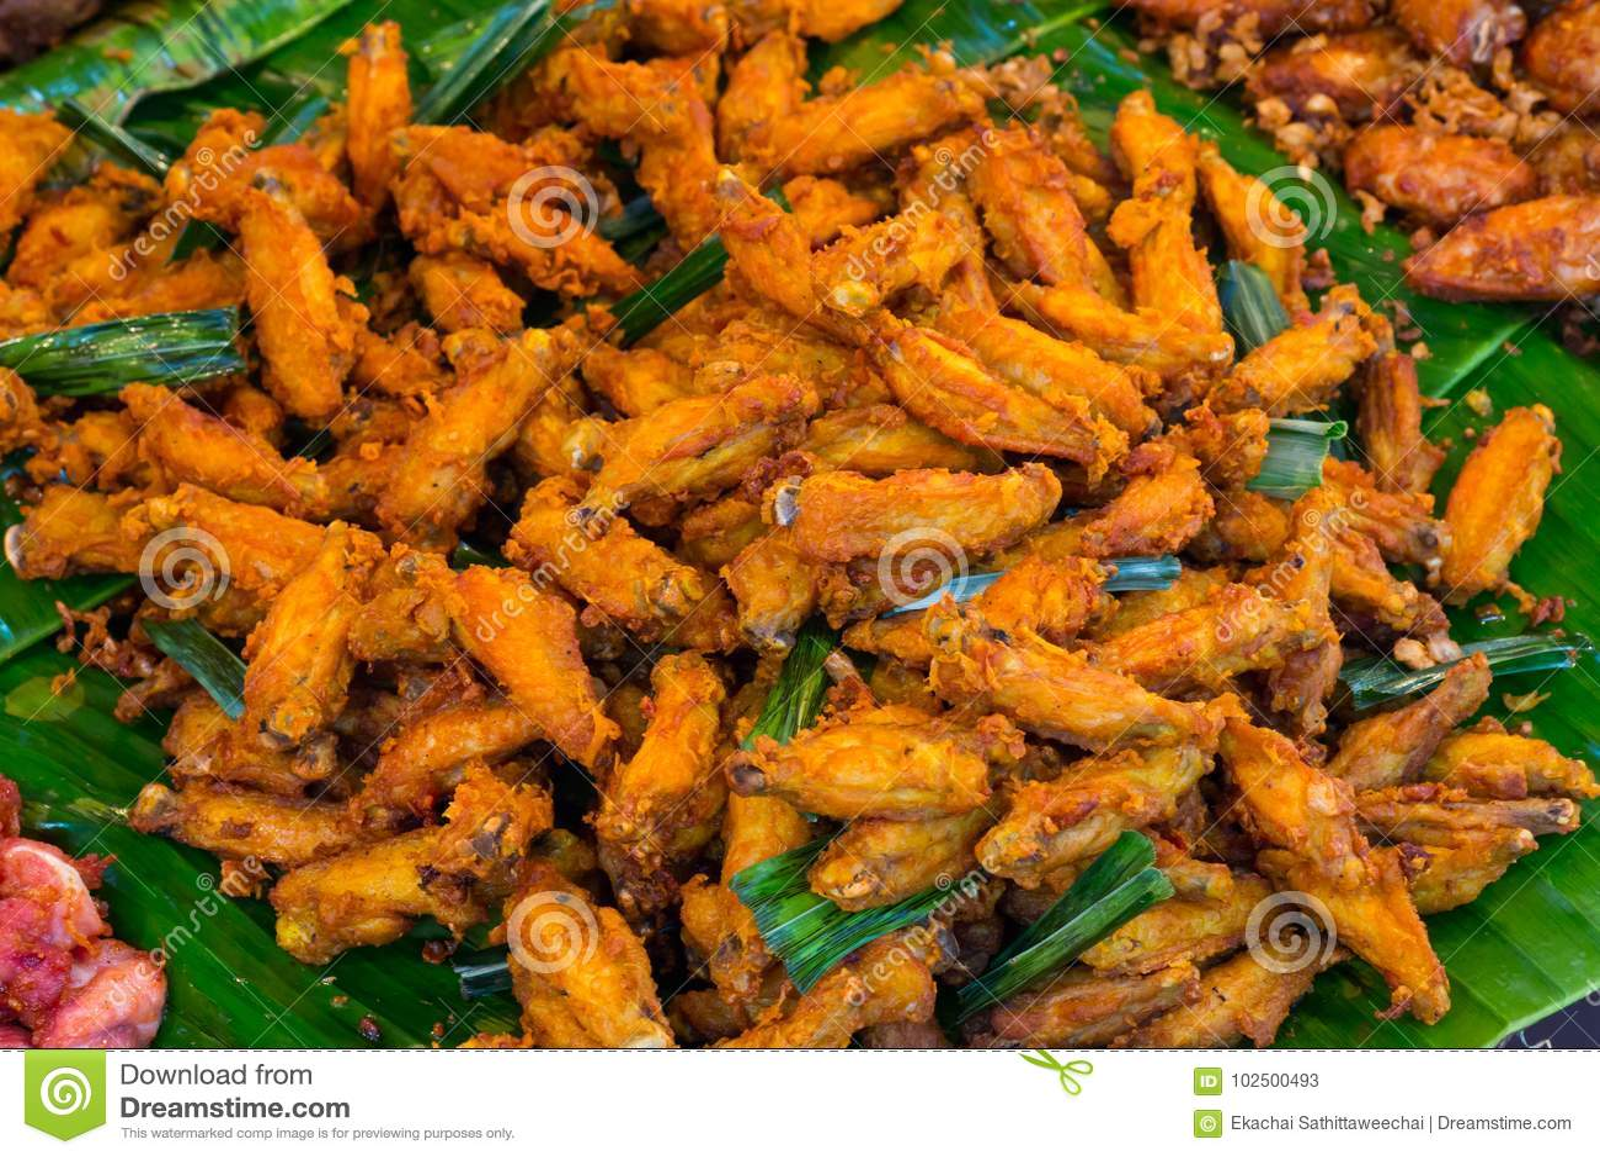 Frittierte Hühnerflügel Büffel-Hühnerflügel Würziges Lebensmittel und